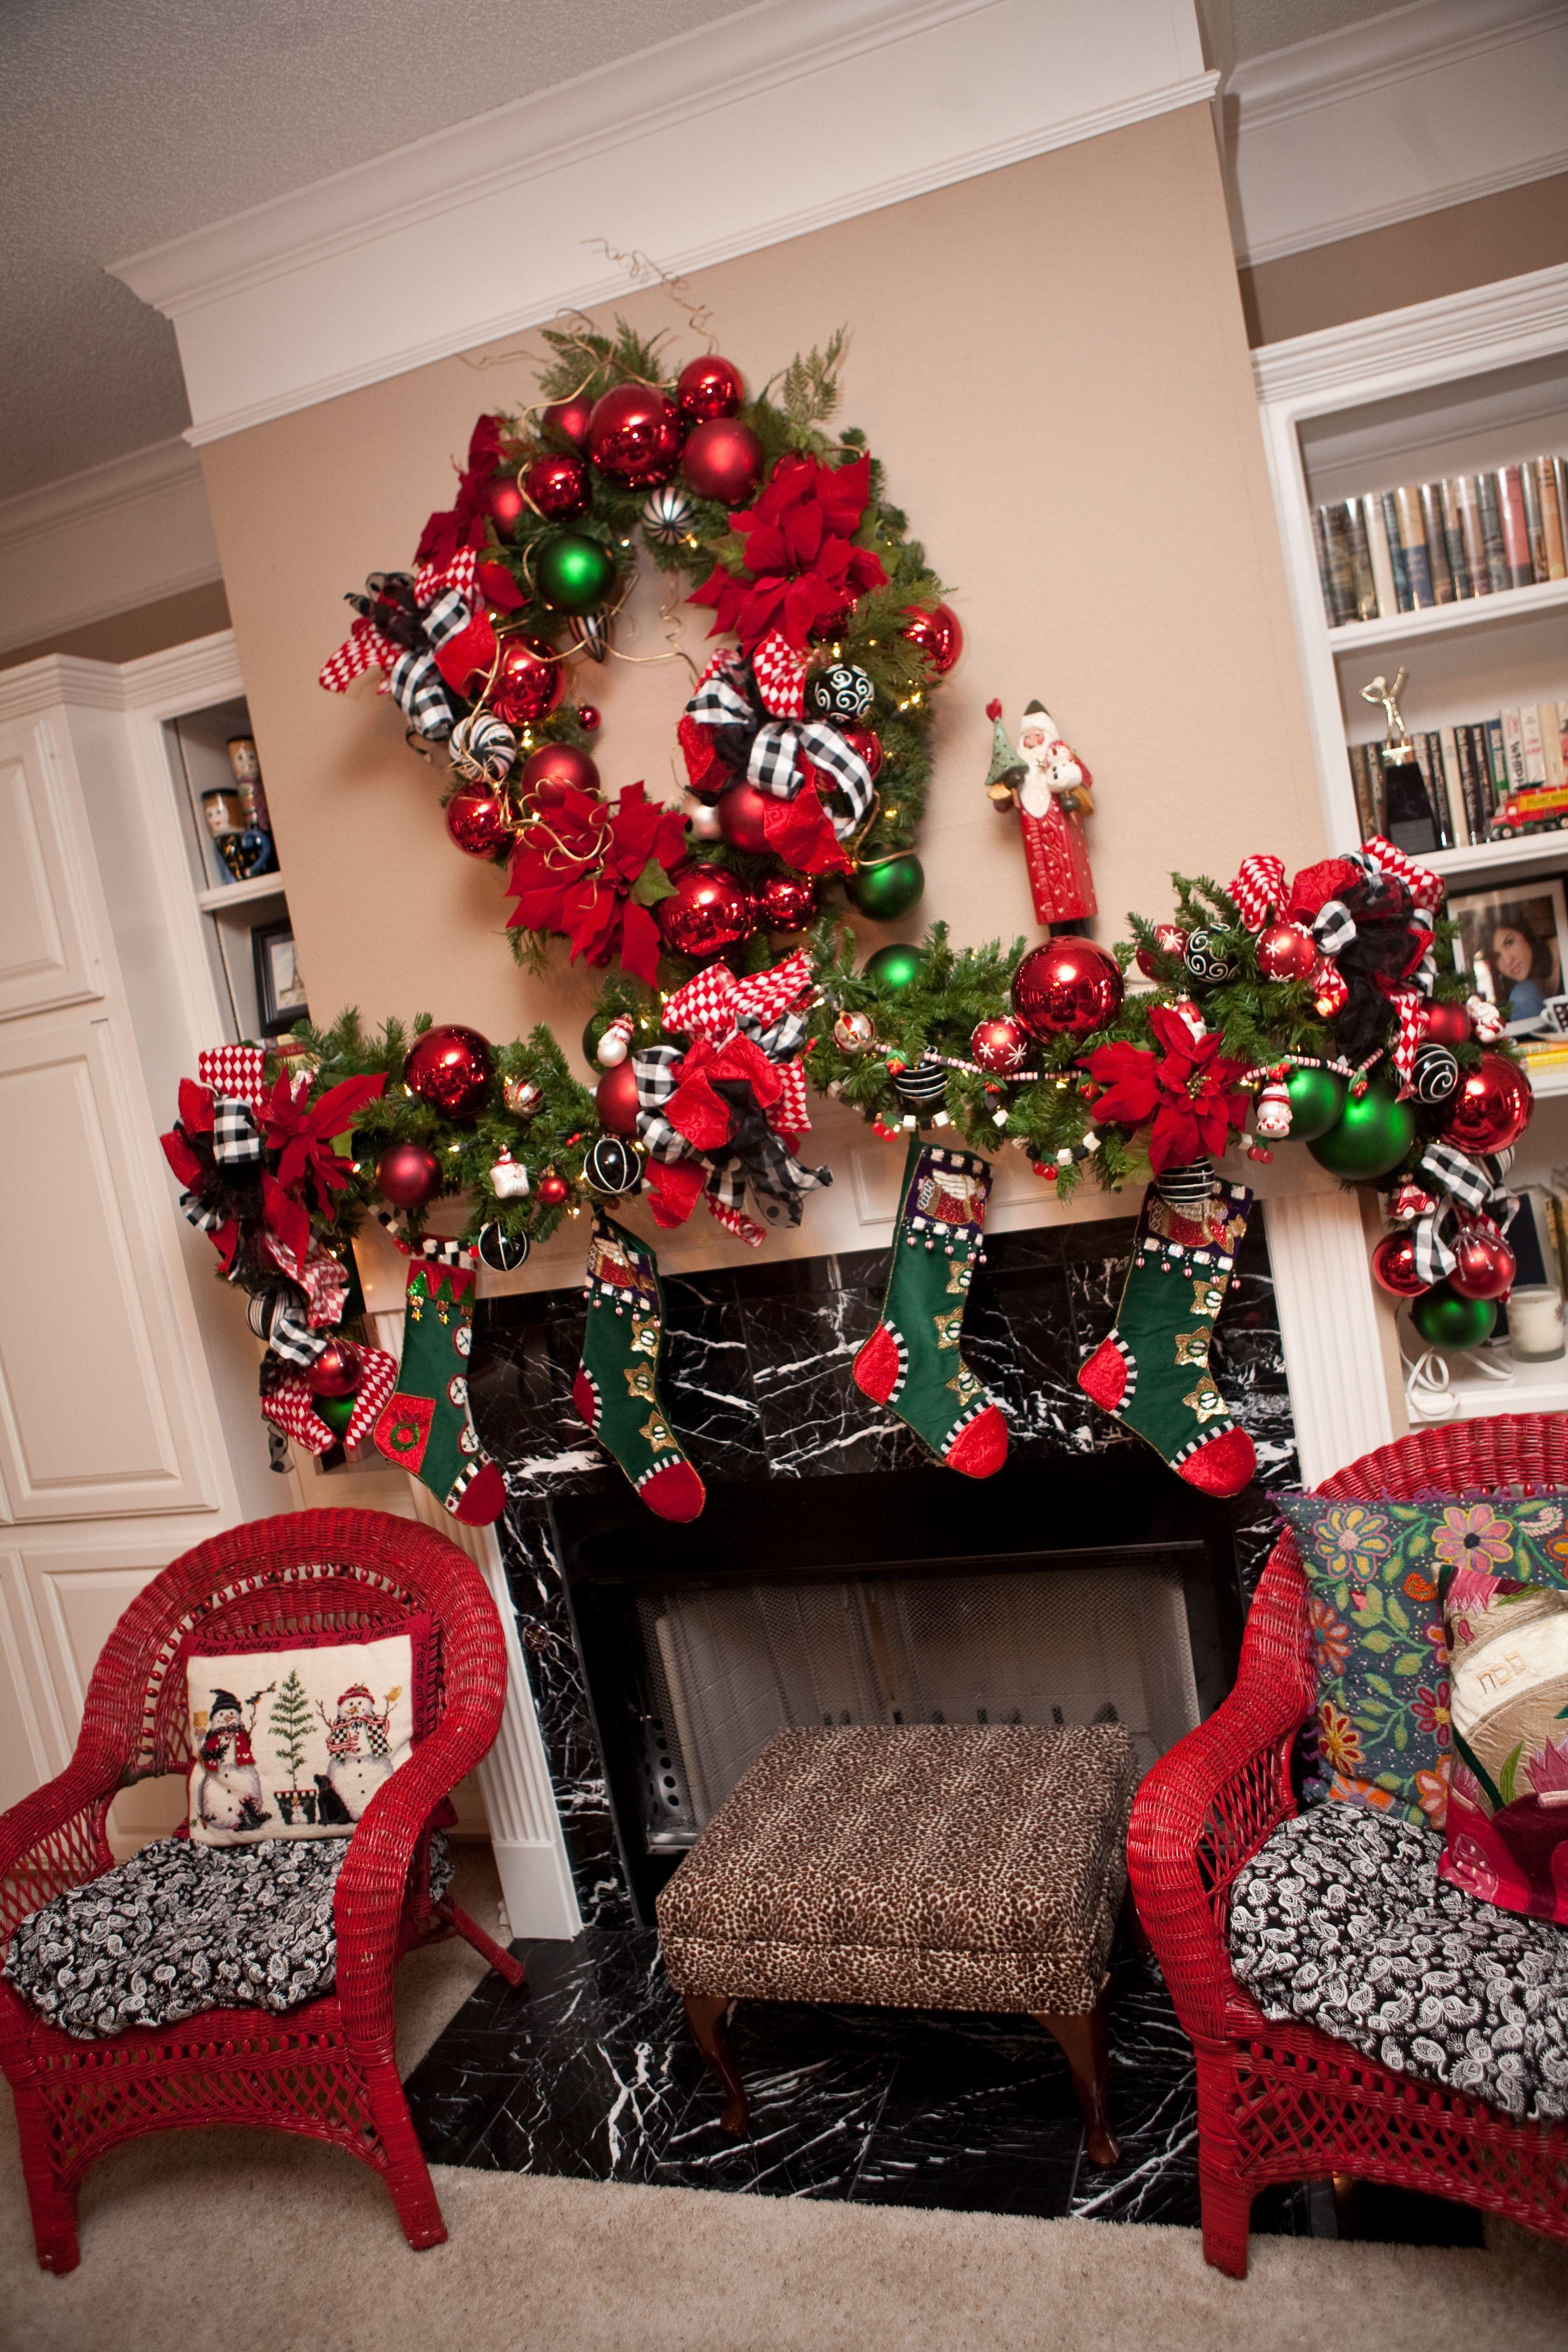 Have A Jolly Holiday Holiday Decor Christmas Home Holiday Mantel